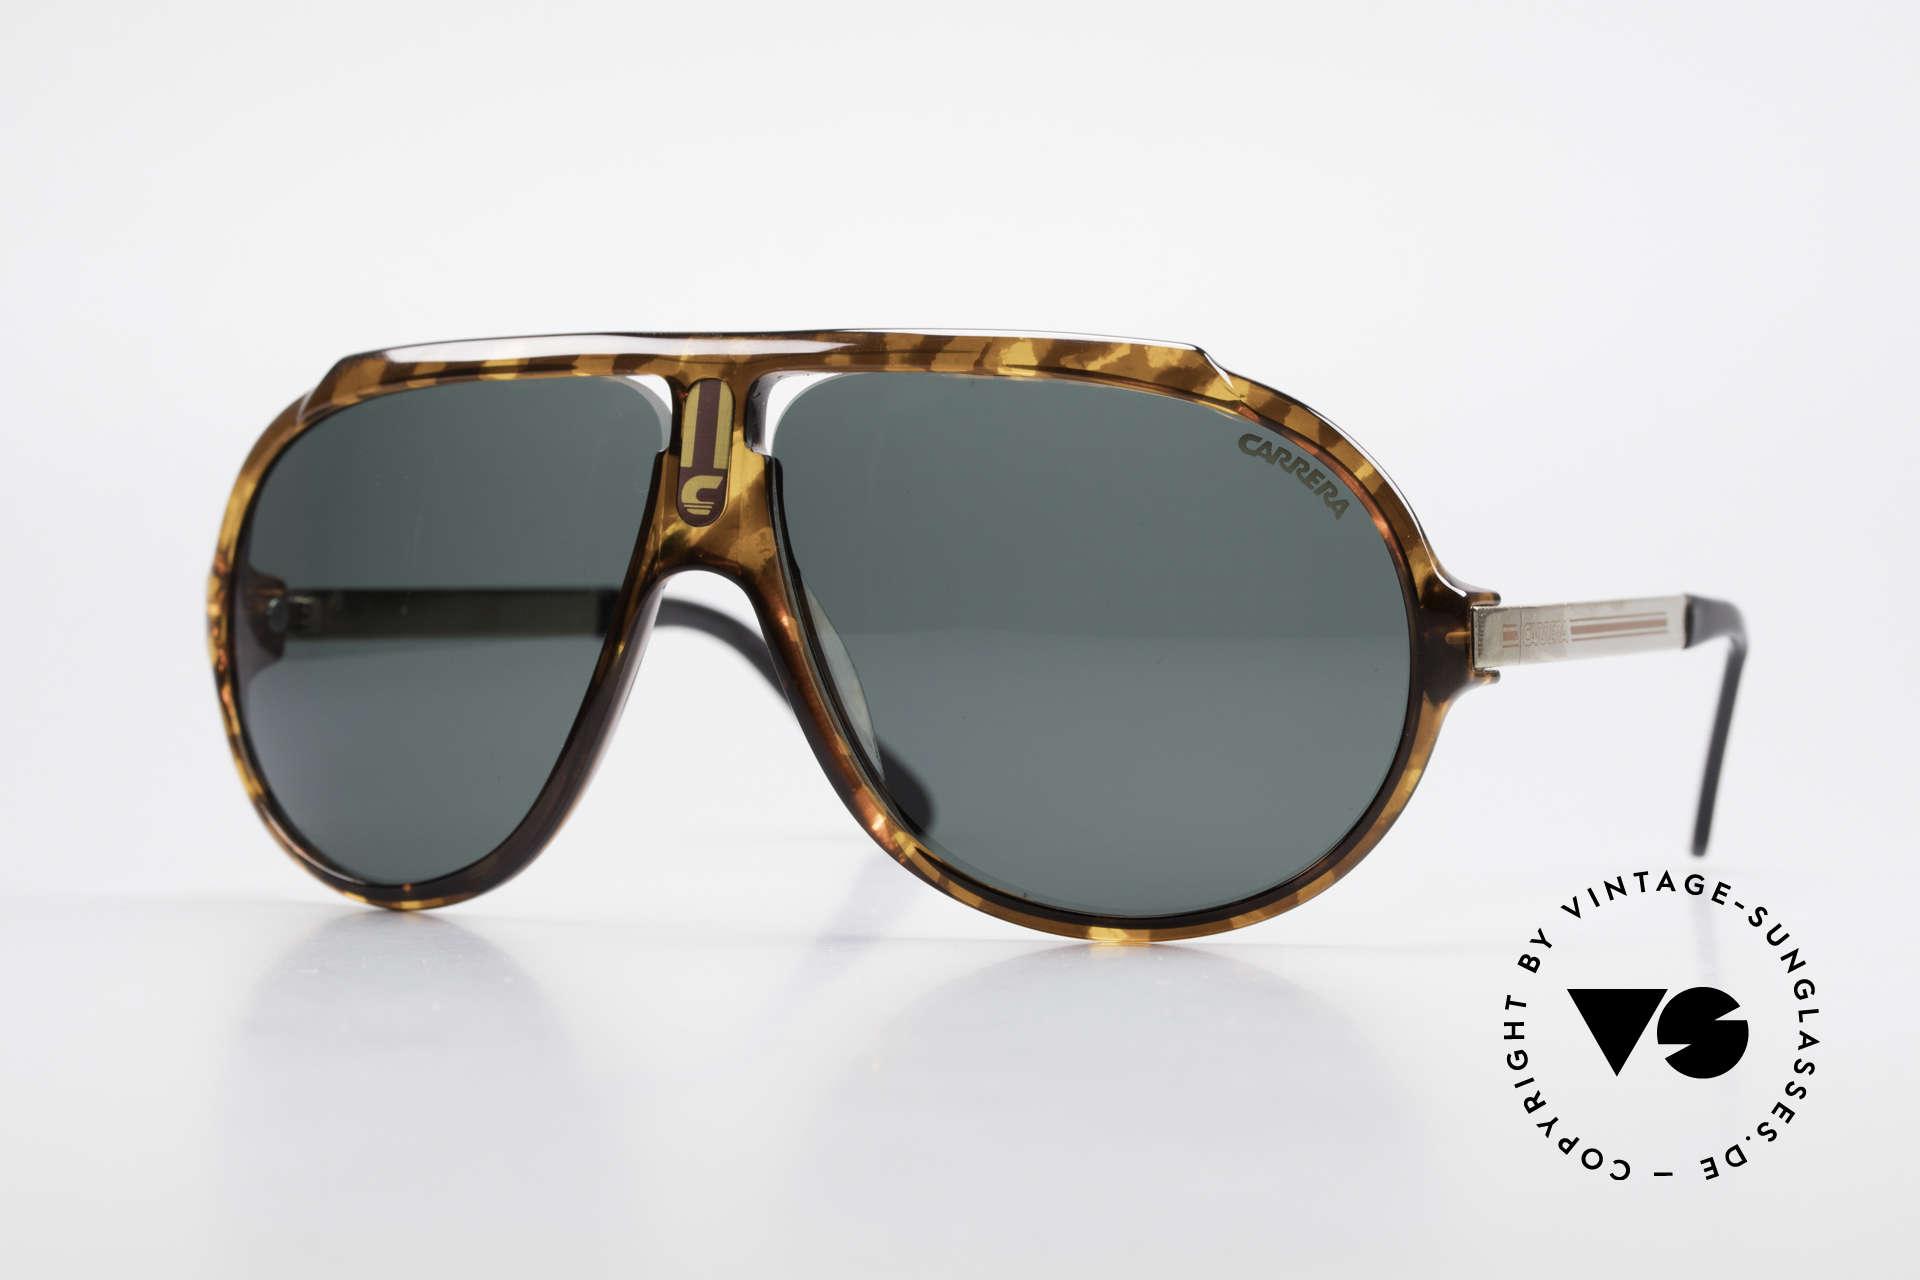 Carrera 5512 80's Sunglasses Don Johnson, legendary 1980's vintage CARRERA designer sunglasses, Made for Men